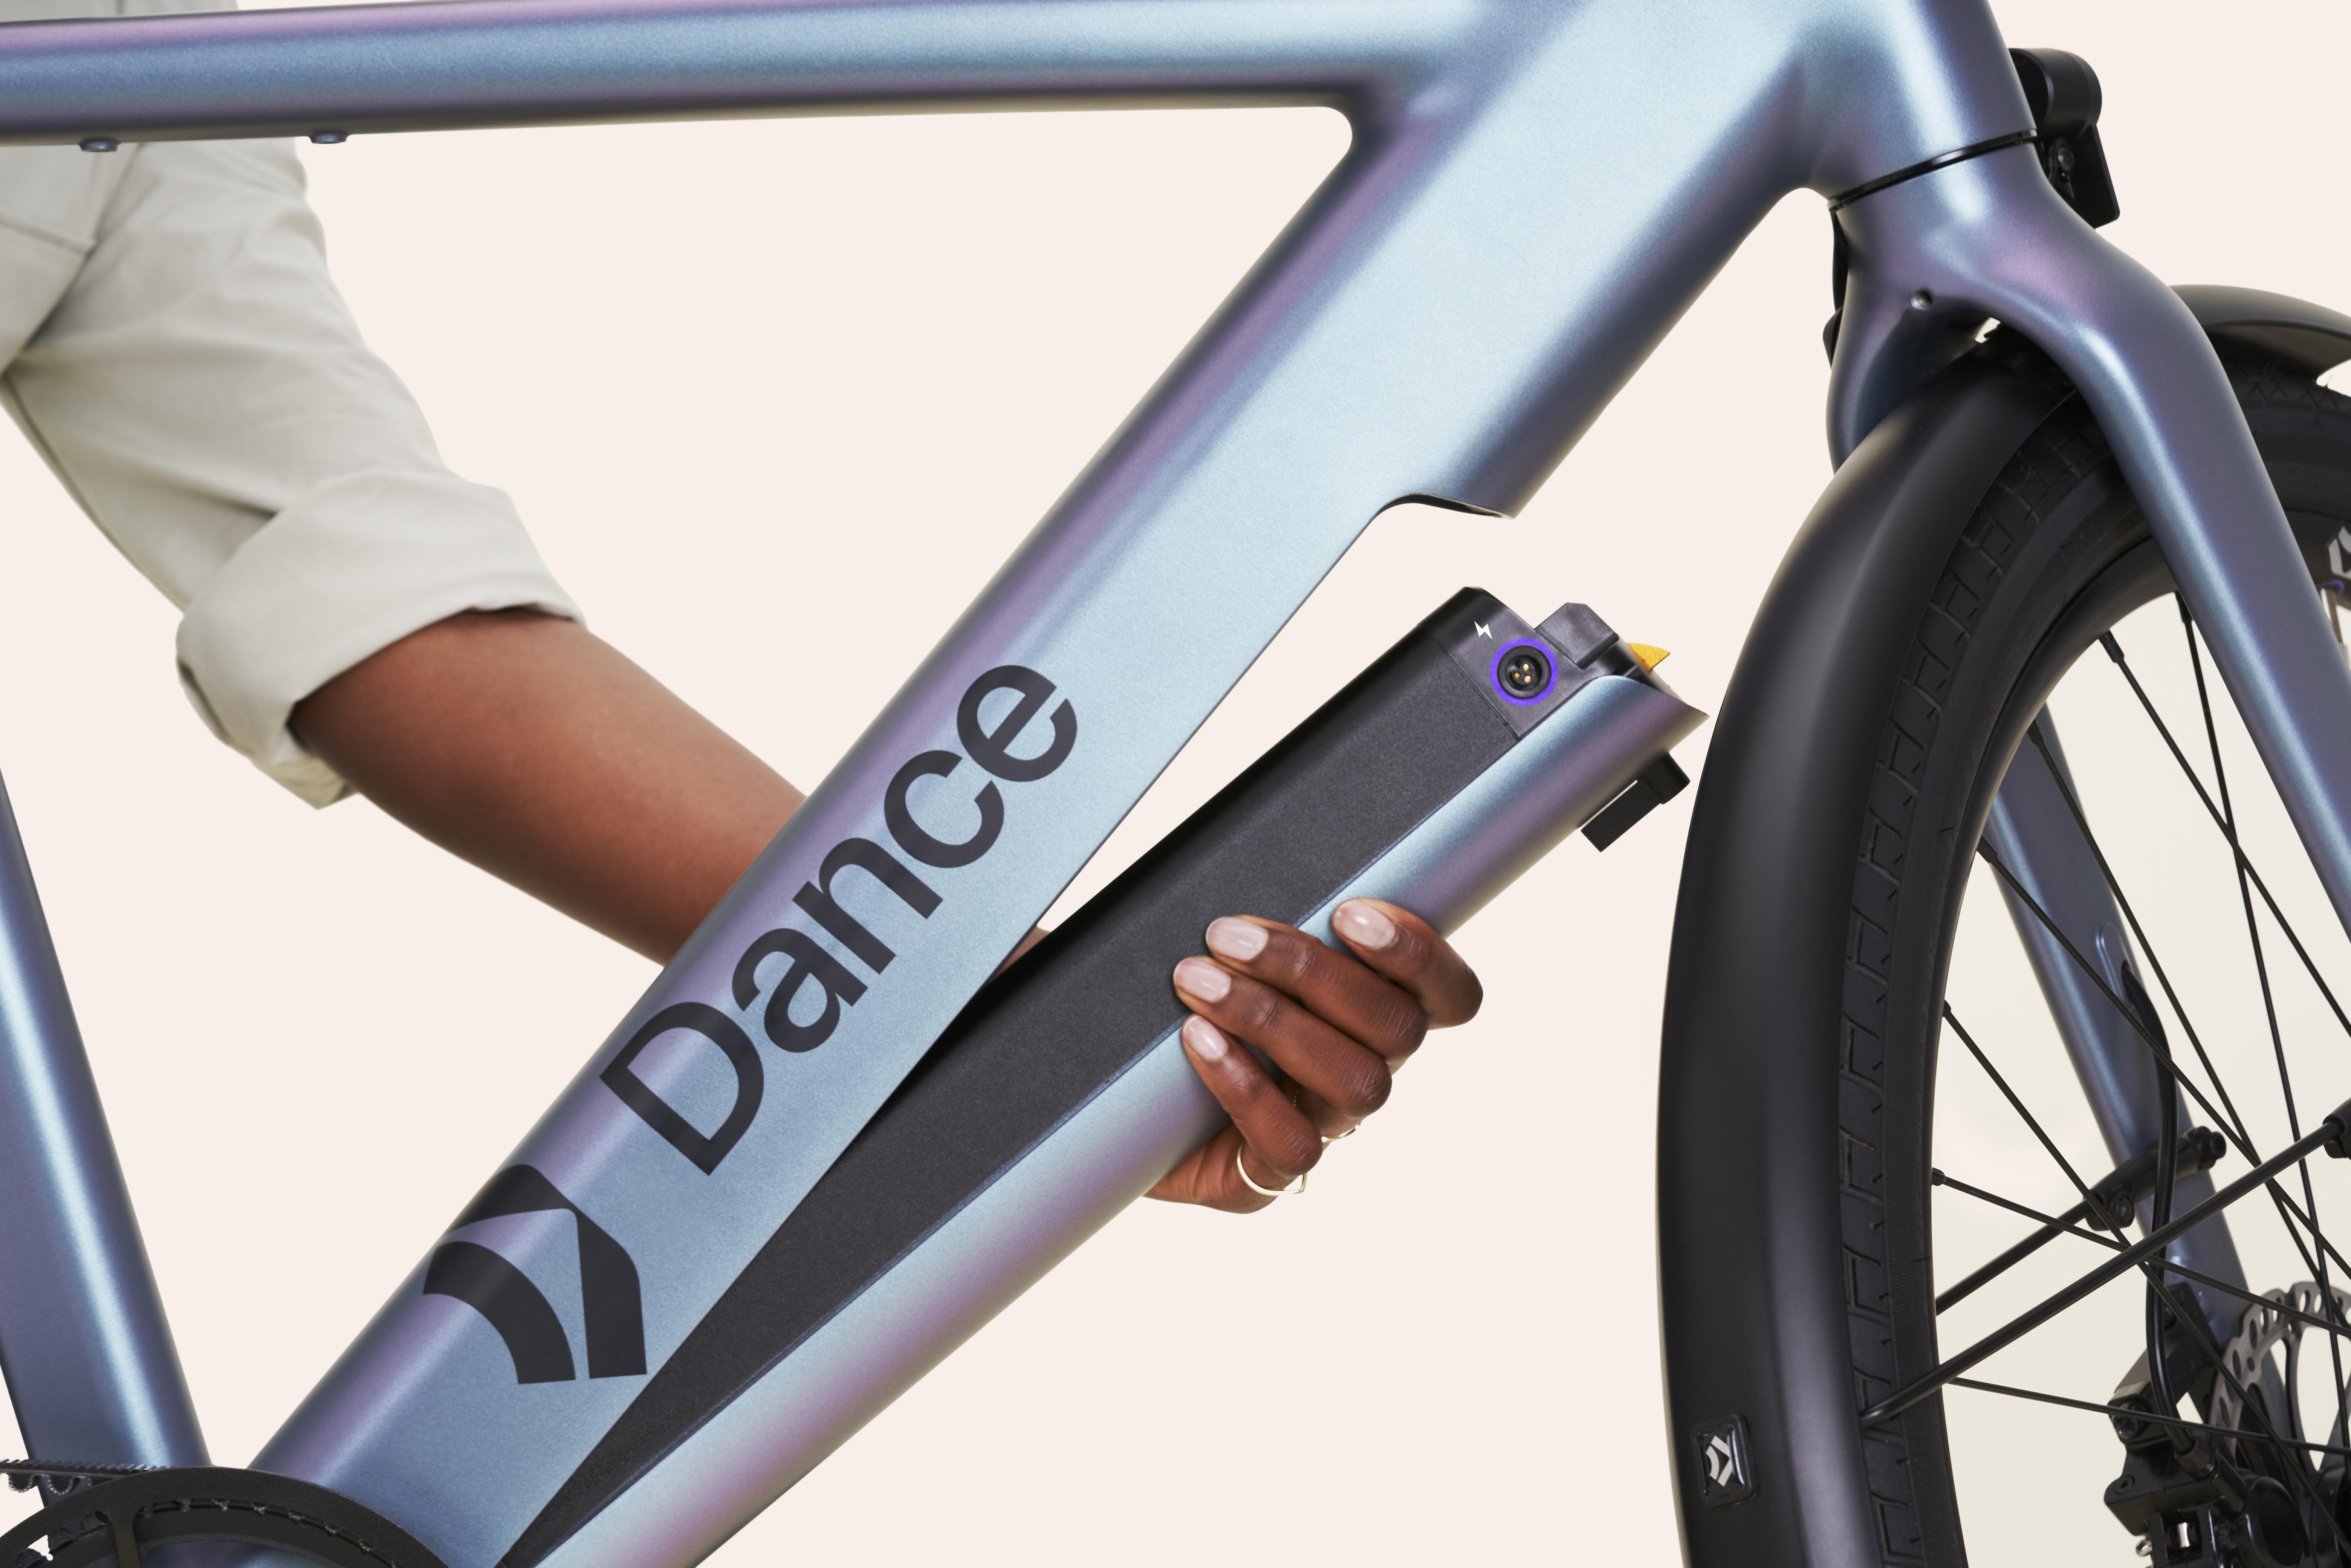 Dance ebike removable battery